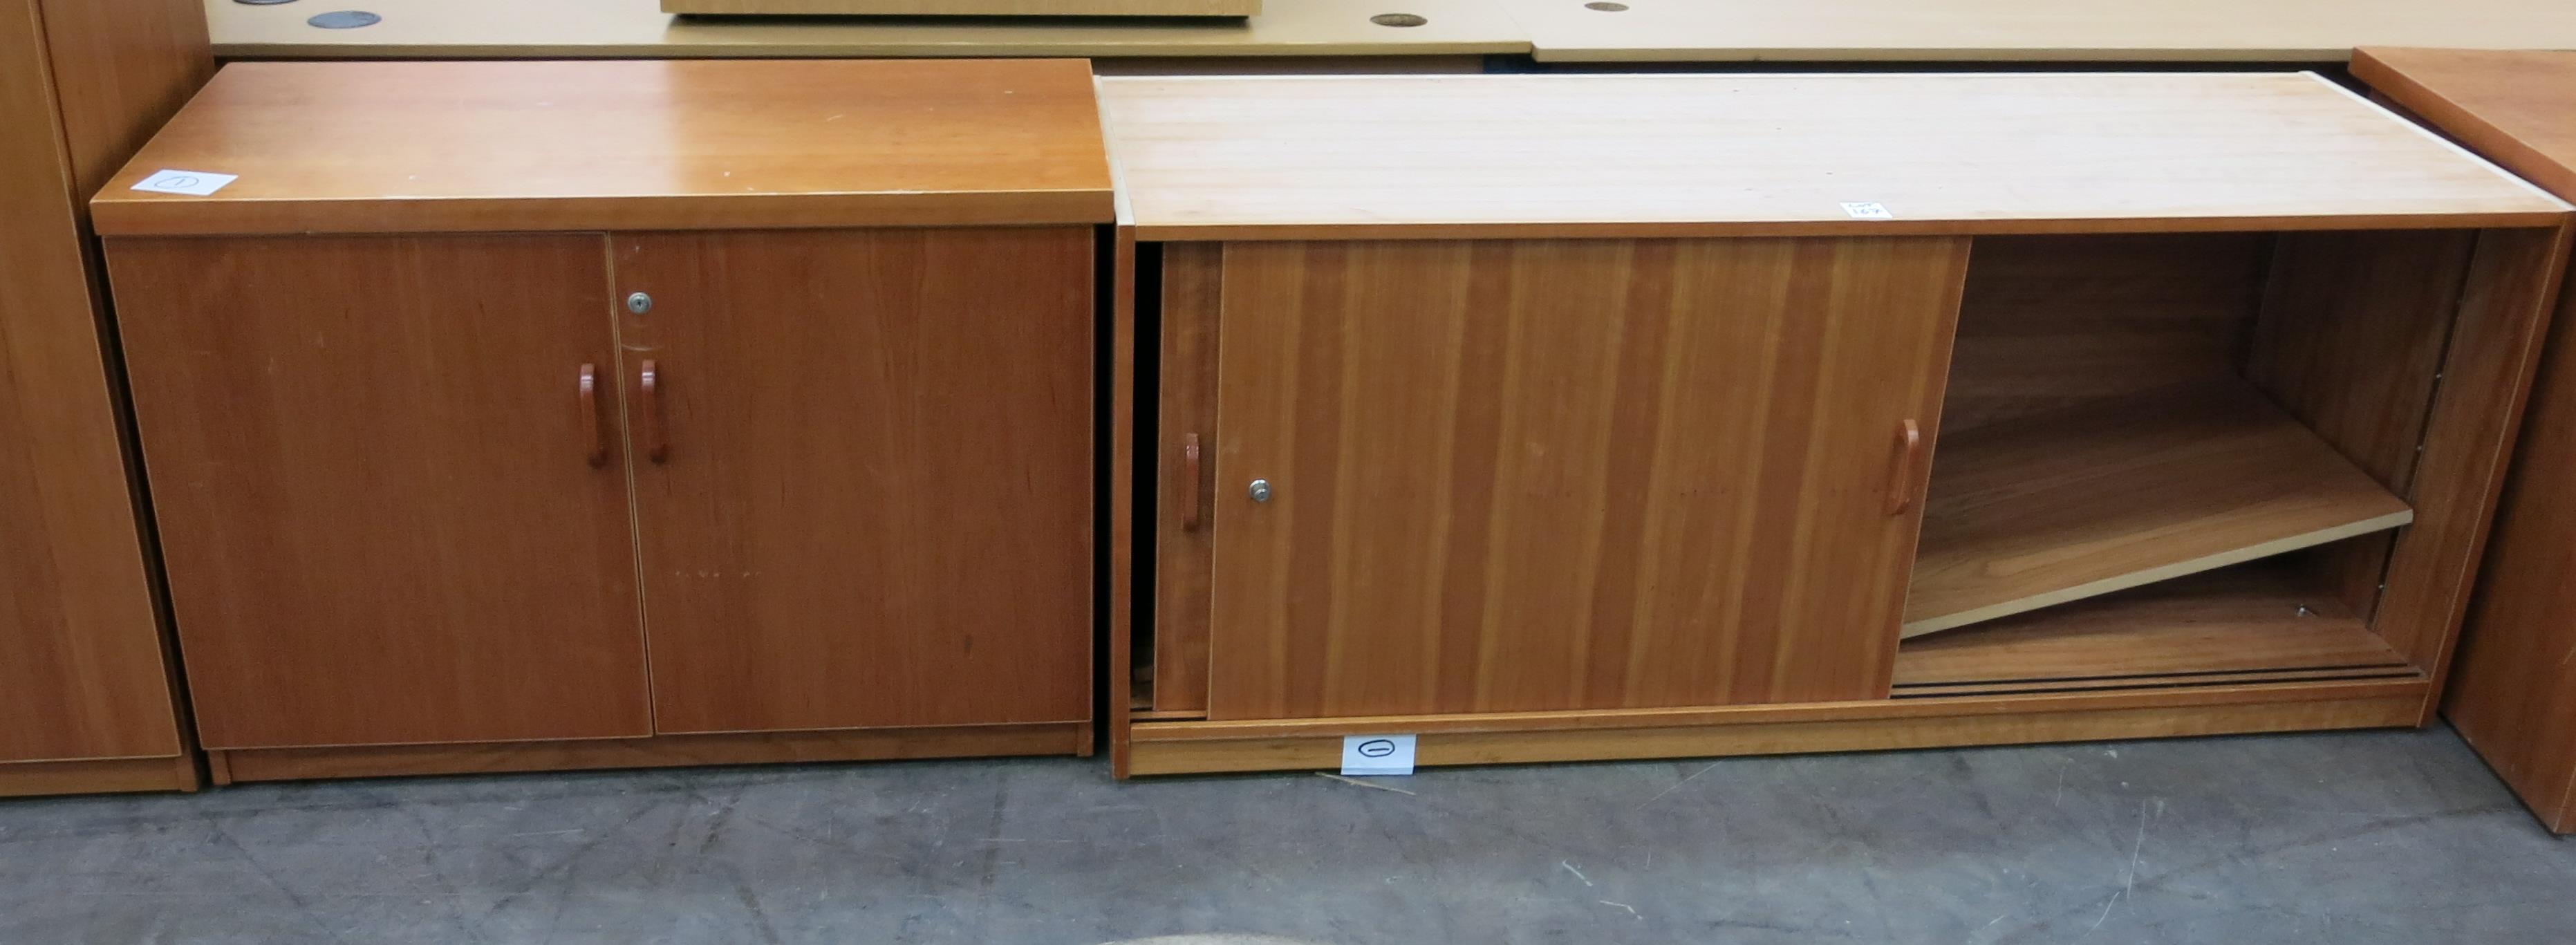 Cherry Wood Office Furniture Uk Almirah Beds